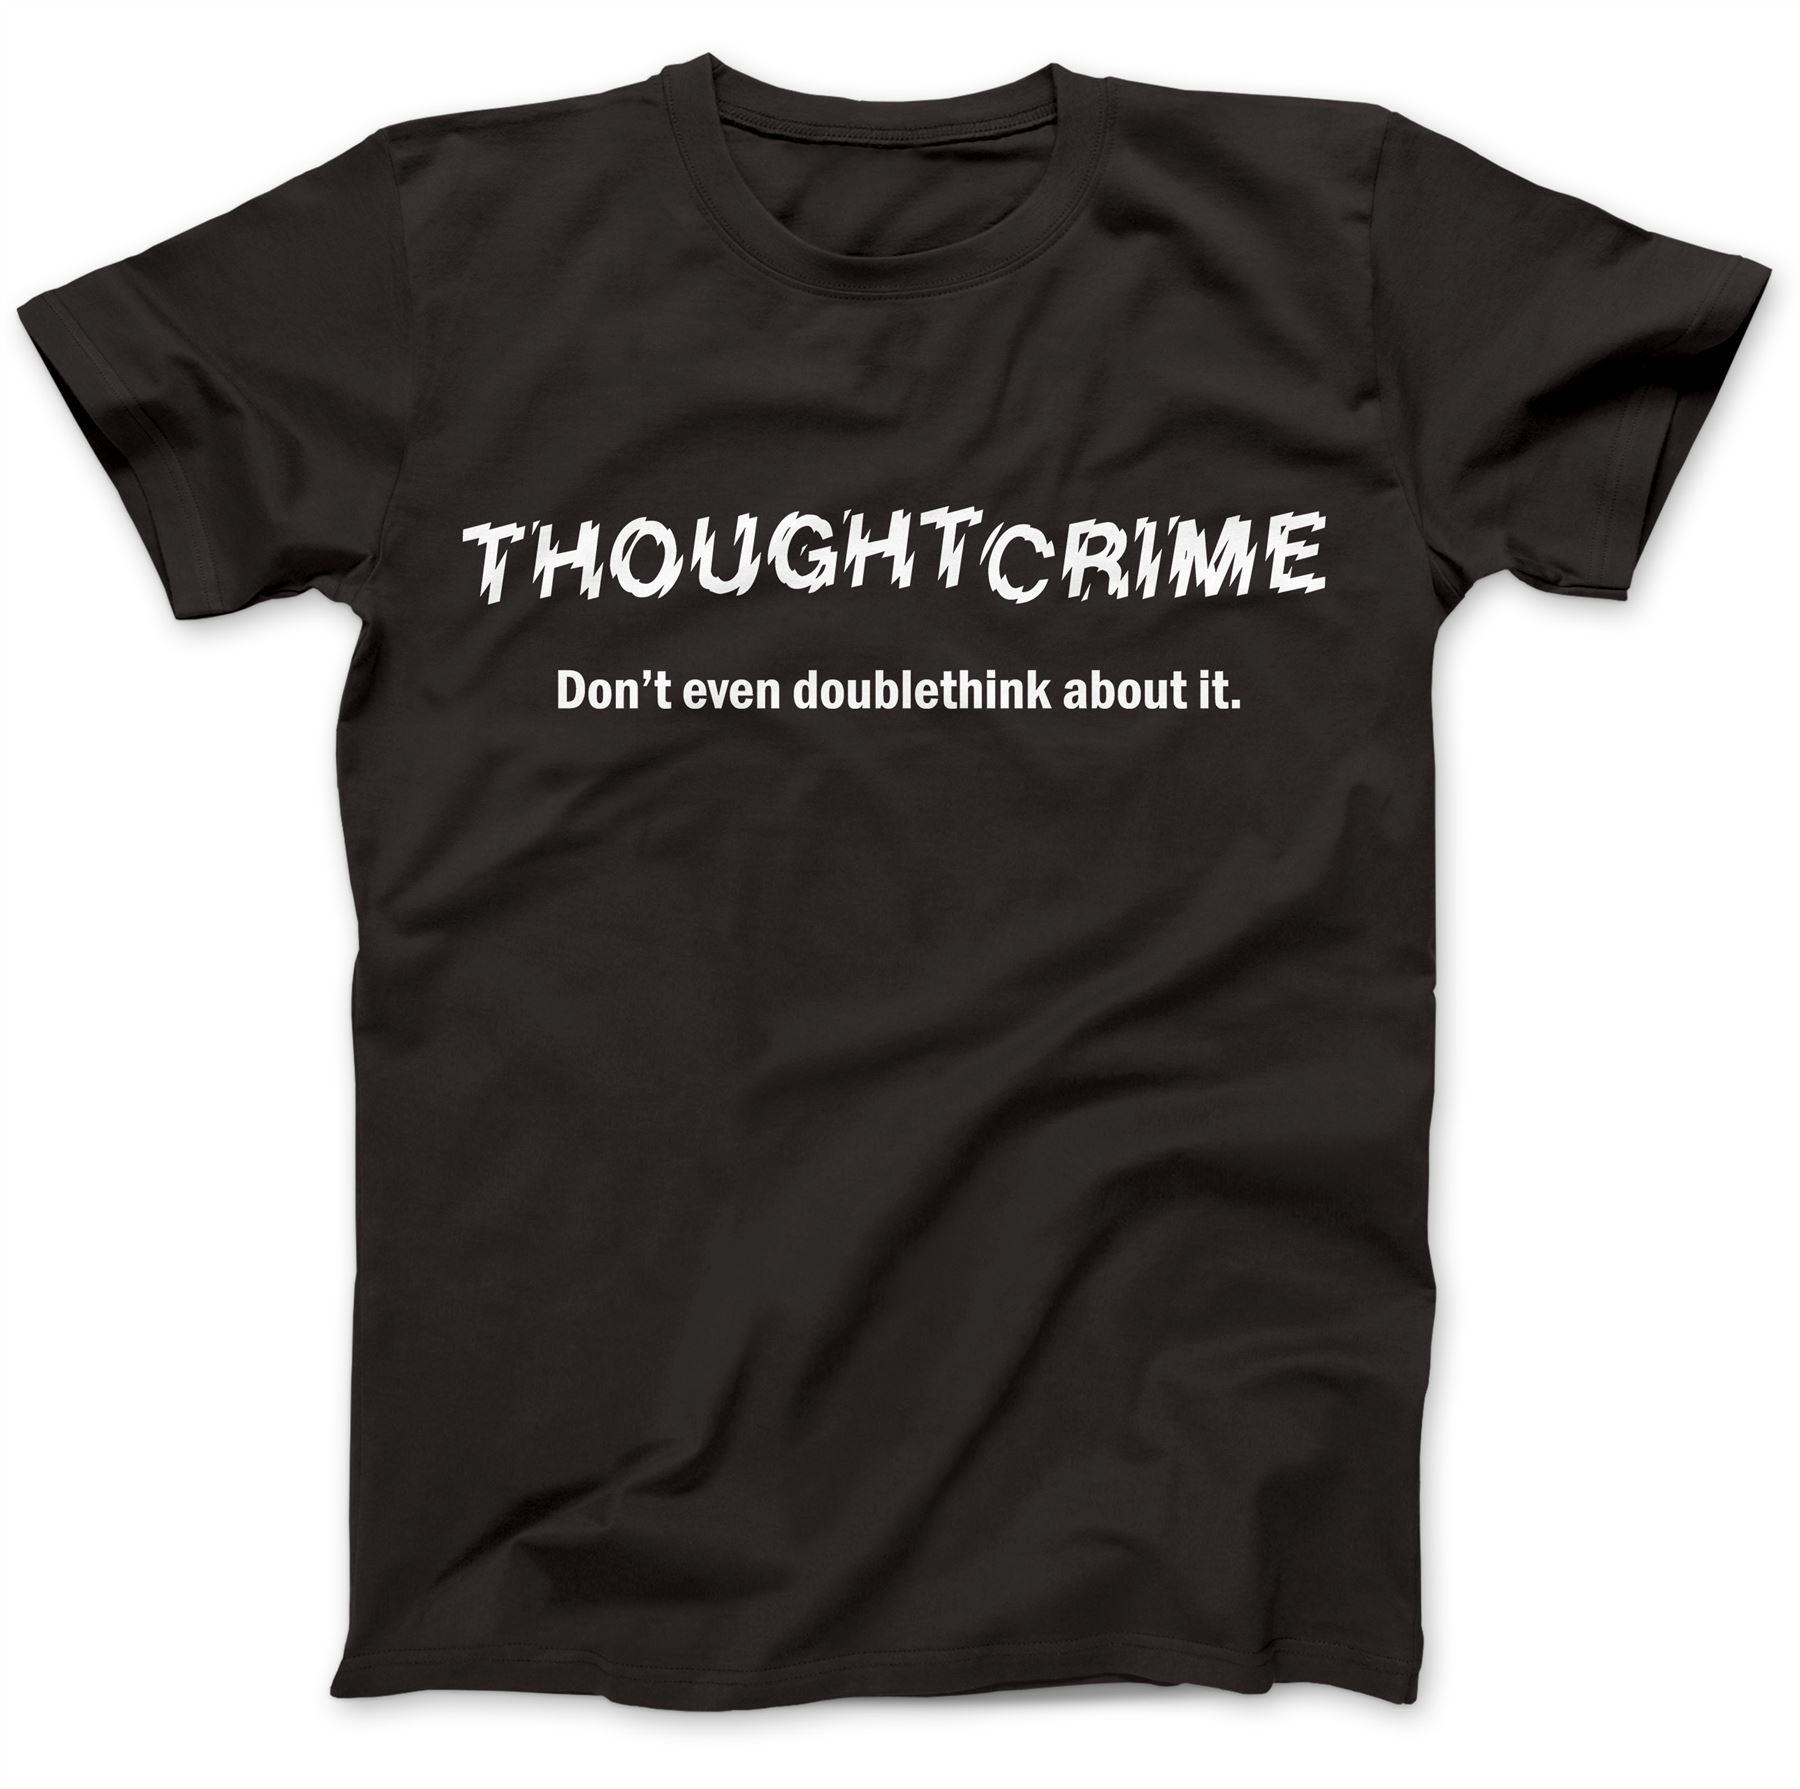 1984-Thought-Crime-George-Orwell-T-Shirt-100-Premium-Cotton-Animal-Farm miniatuur 3